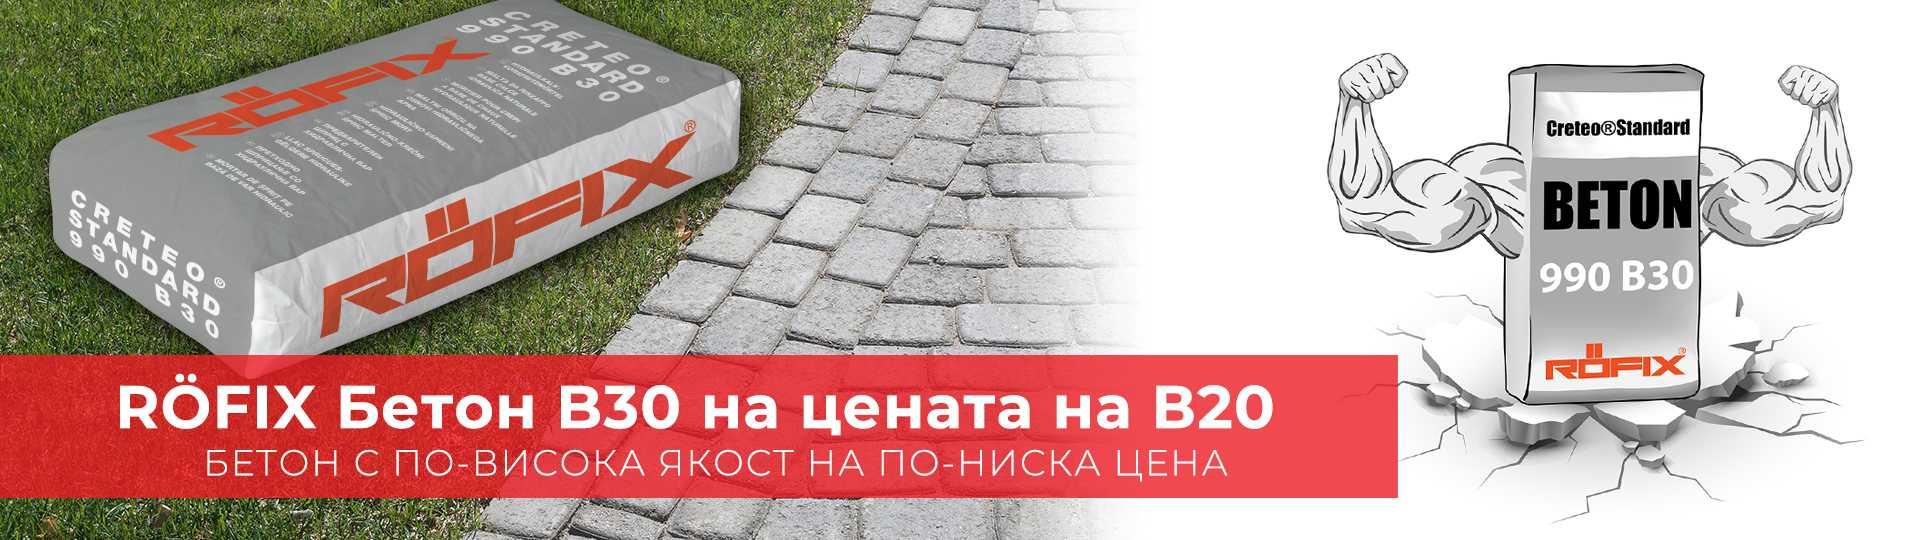 Сух бетон Creteo®Standard 990 - B30